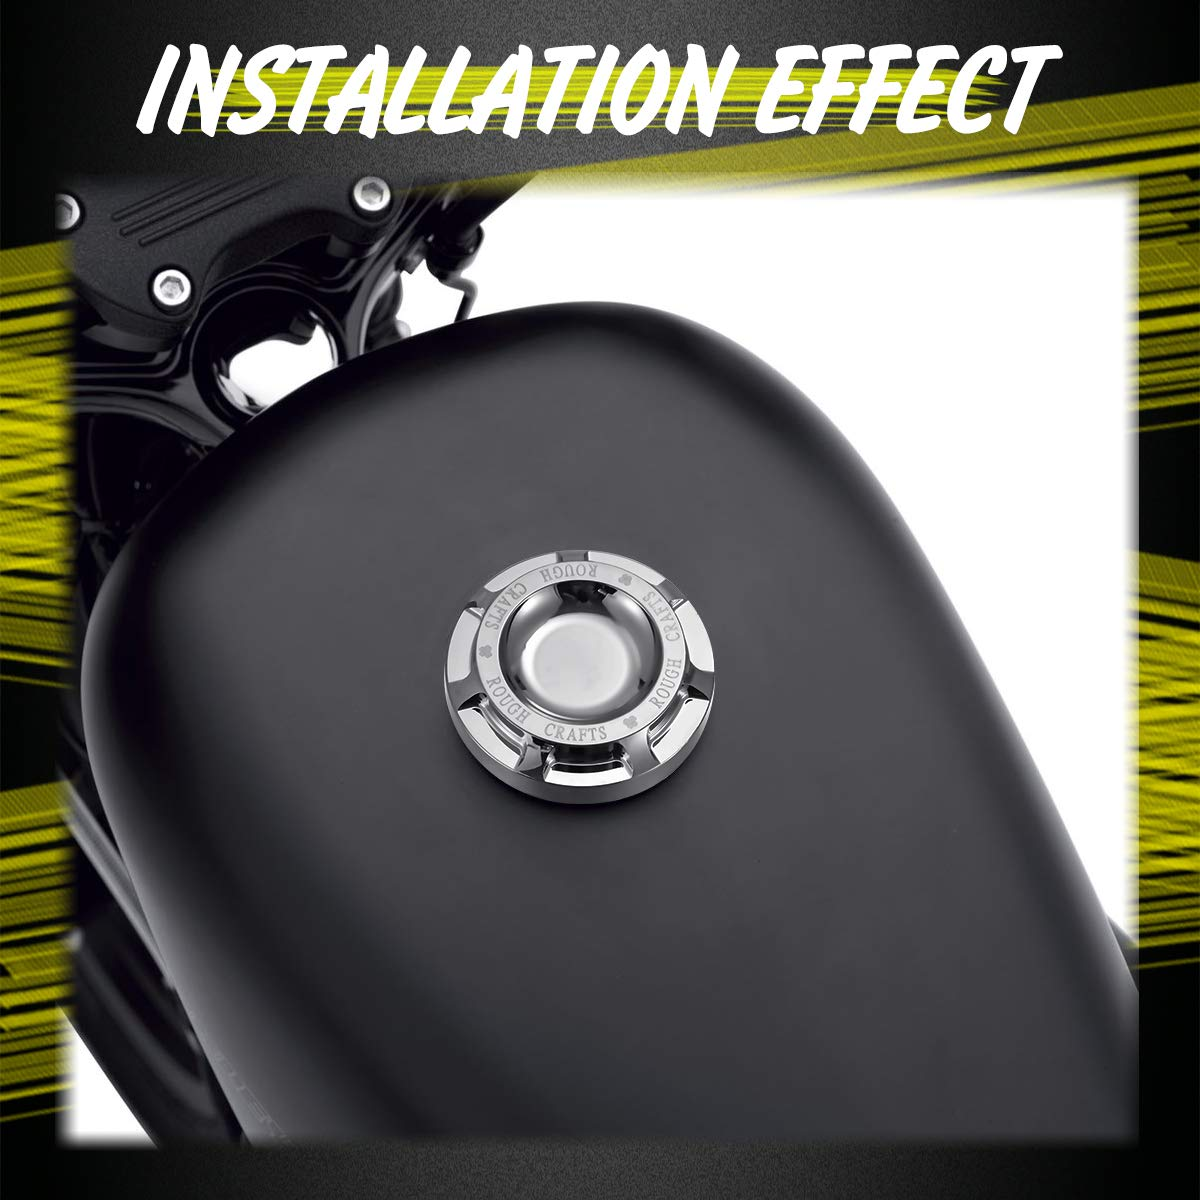 KATUR Cromo Negro Motocicleta CNC Aluminio Tanque de Aceite de Gas de Combustible Artesan/ías en Bruto Cubierta de Aceite Decorativa Tapa de Gas para Harley Sportster XL1200 883 1996-2014